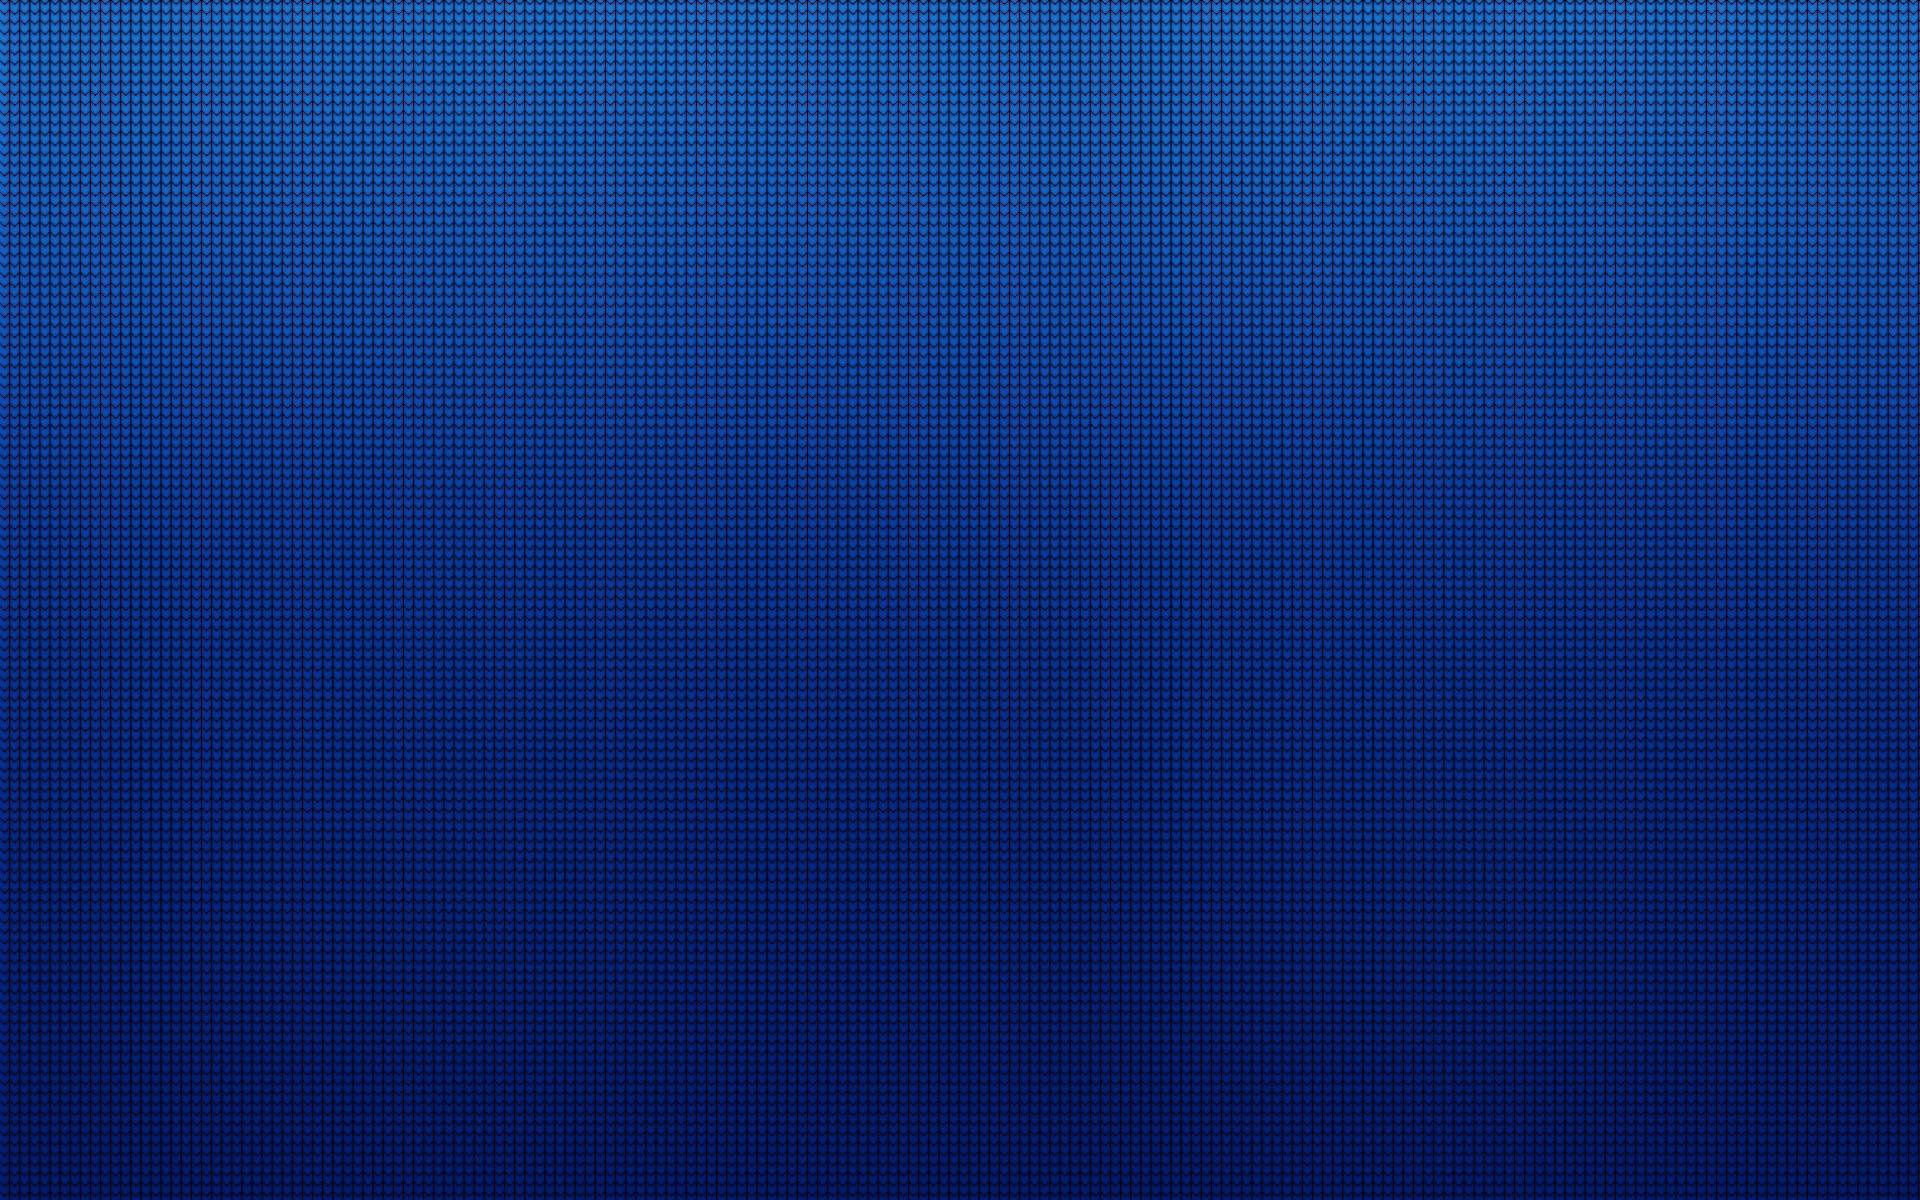 Plain Sky Blue Background Desktop HD Wallpaper 1920x1200